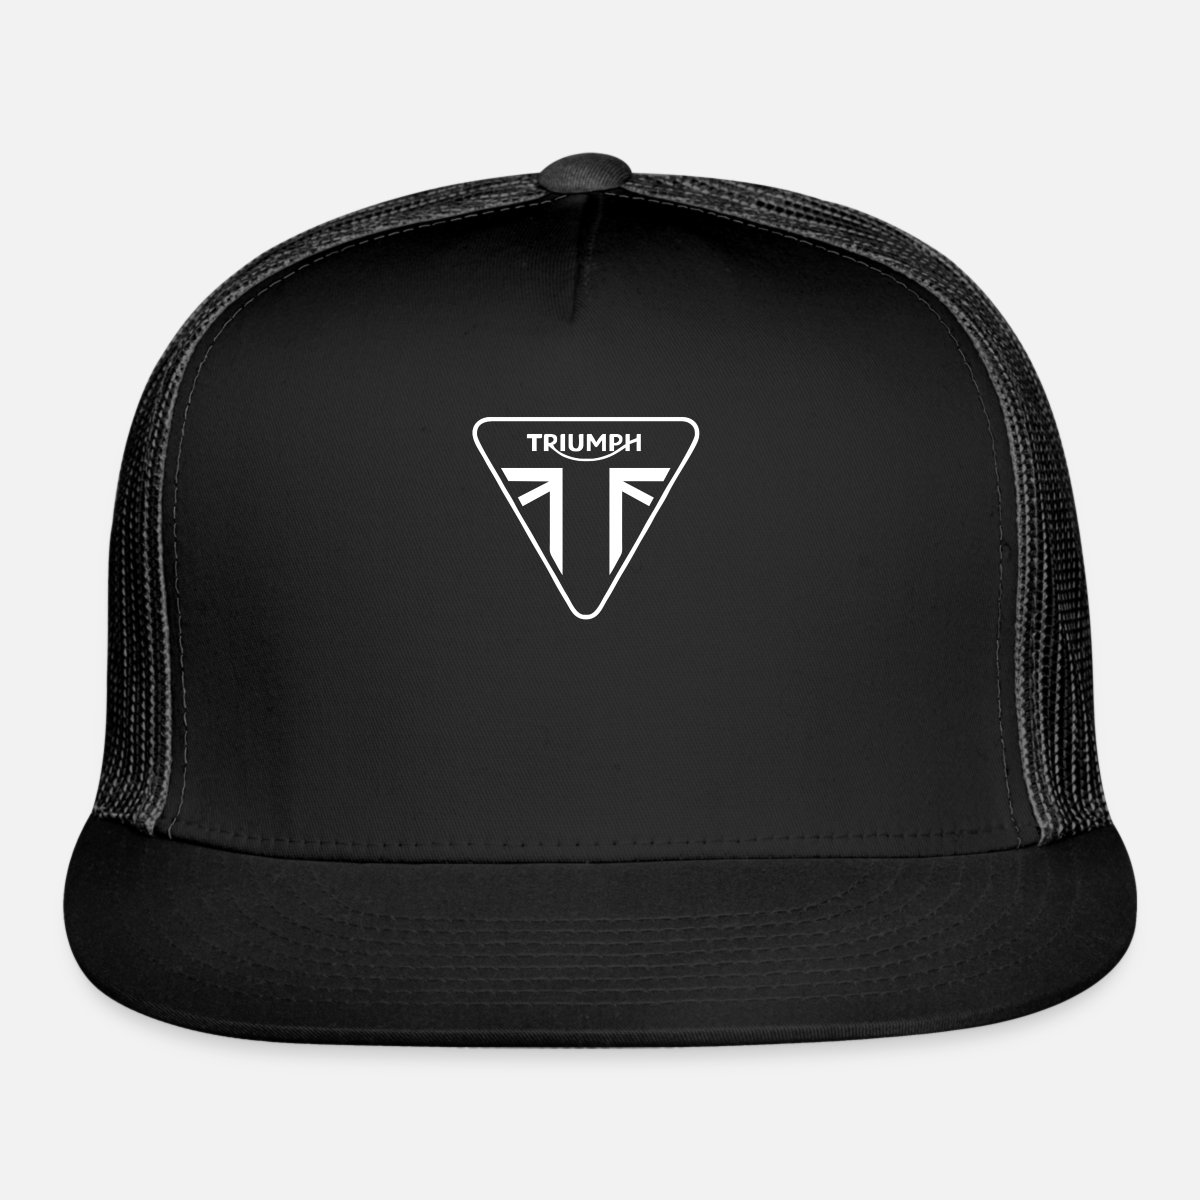 e5a3776b3 Triumph Motorcycle Logo Trucker Cap - black/black